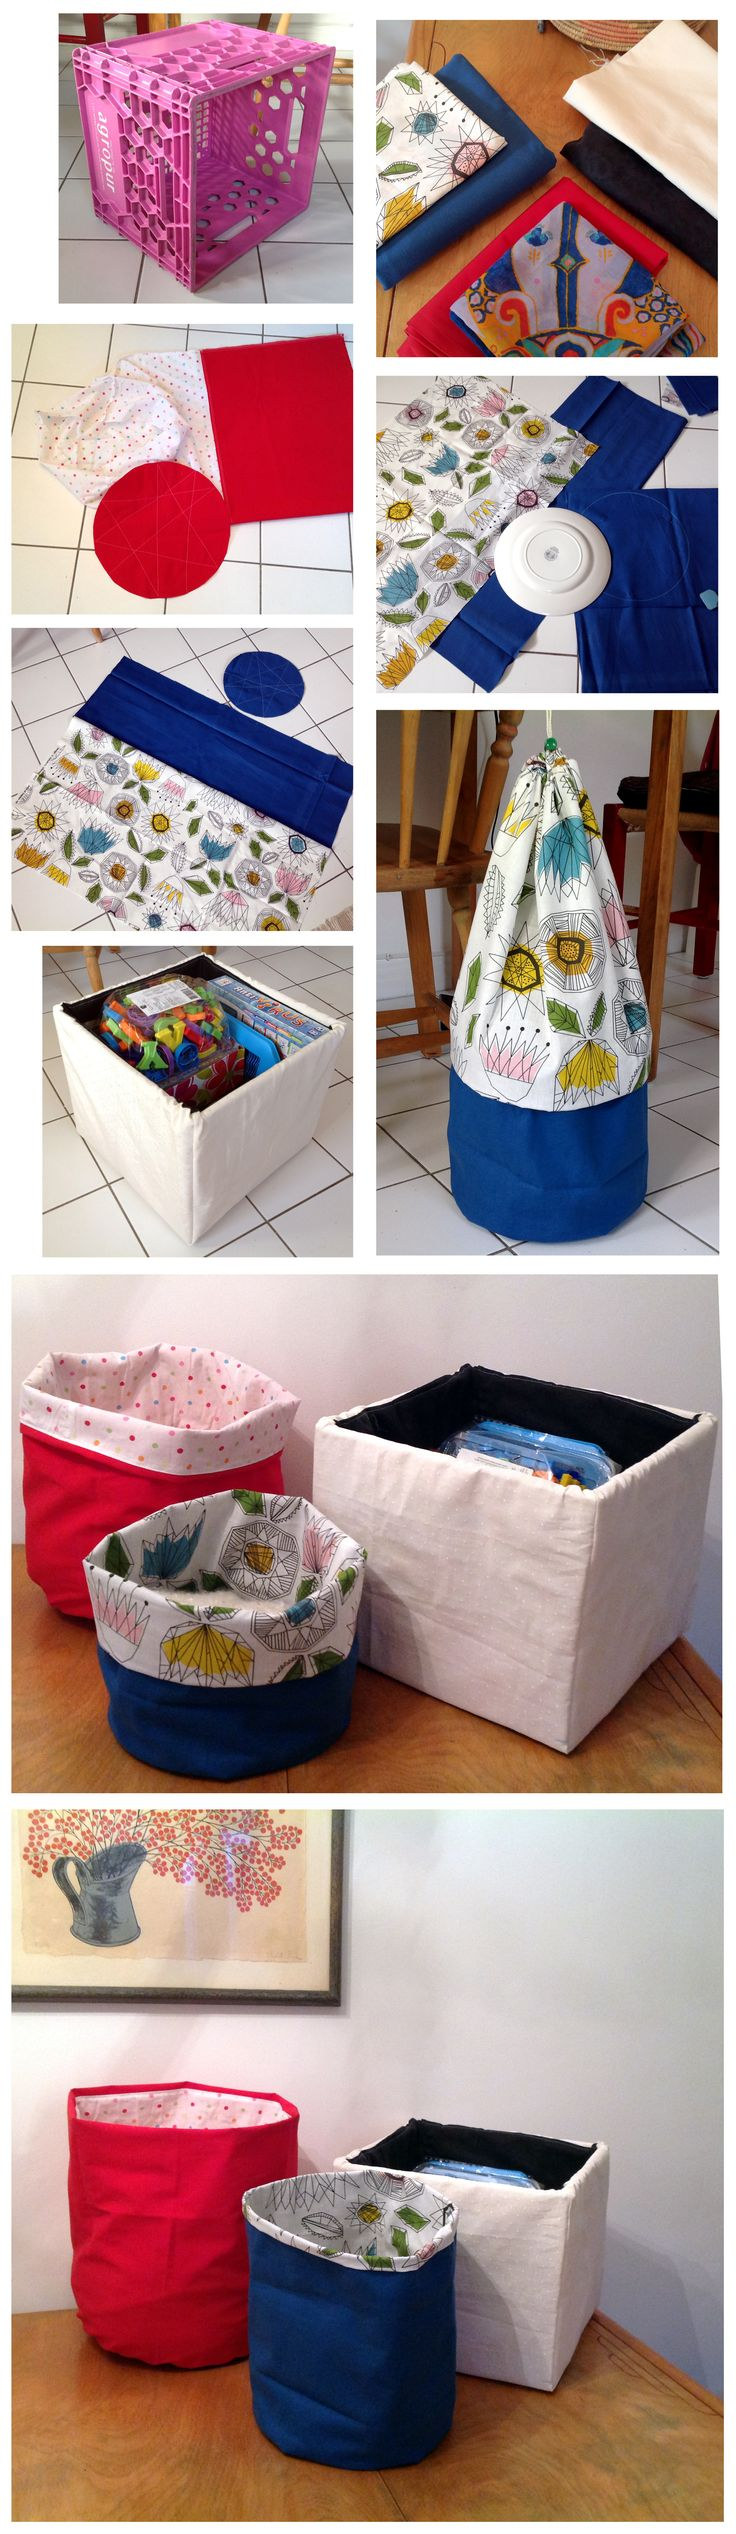 sewing, fabric boxes, panier en tissue, rangement, корзинки из ткани